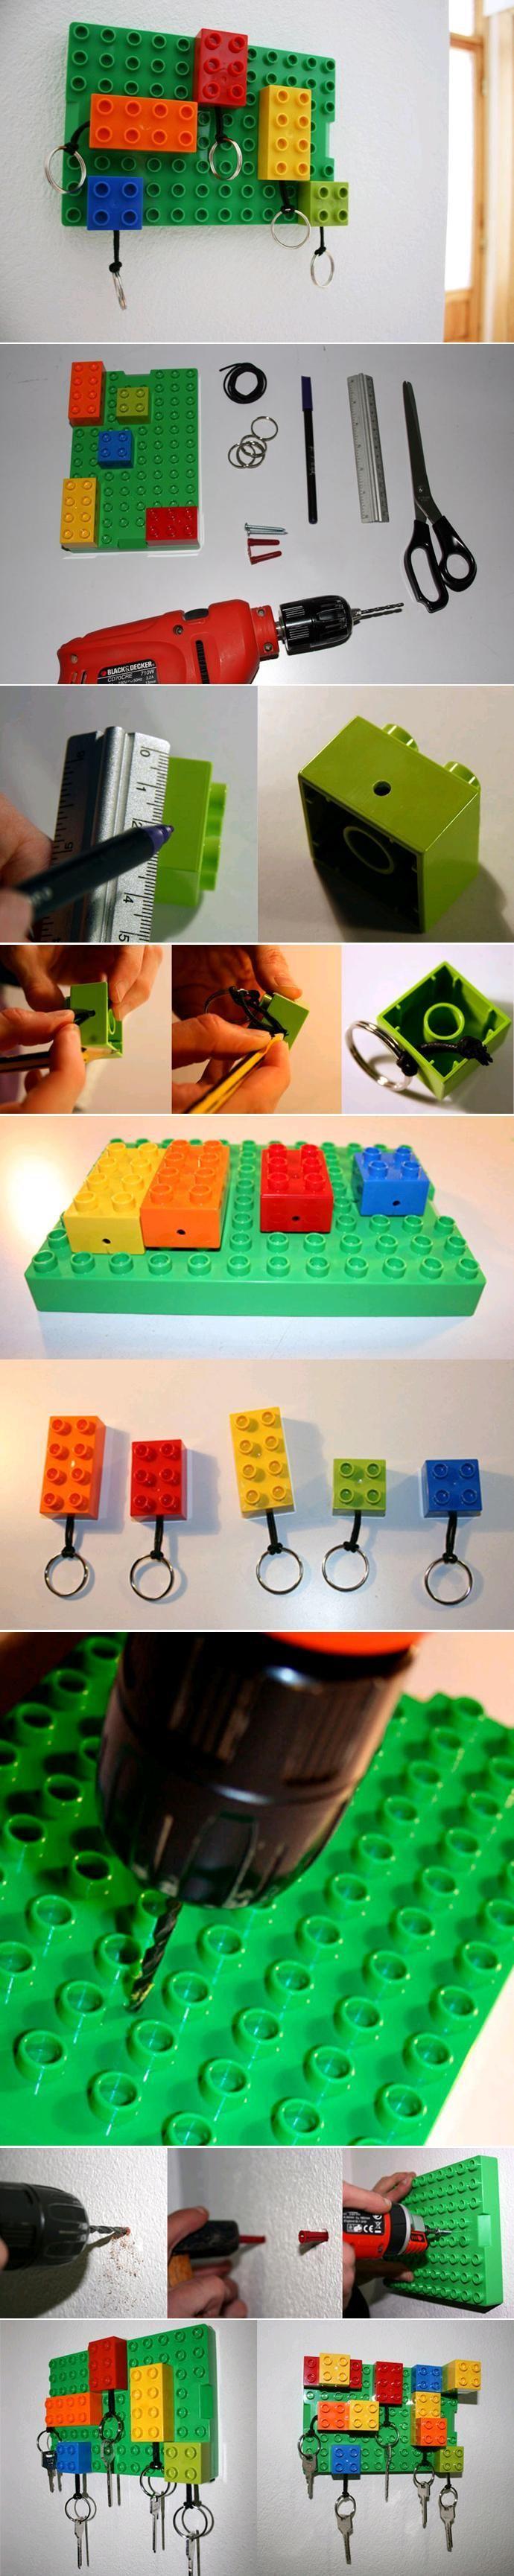 DIY Lego Key Hanger